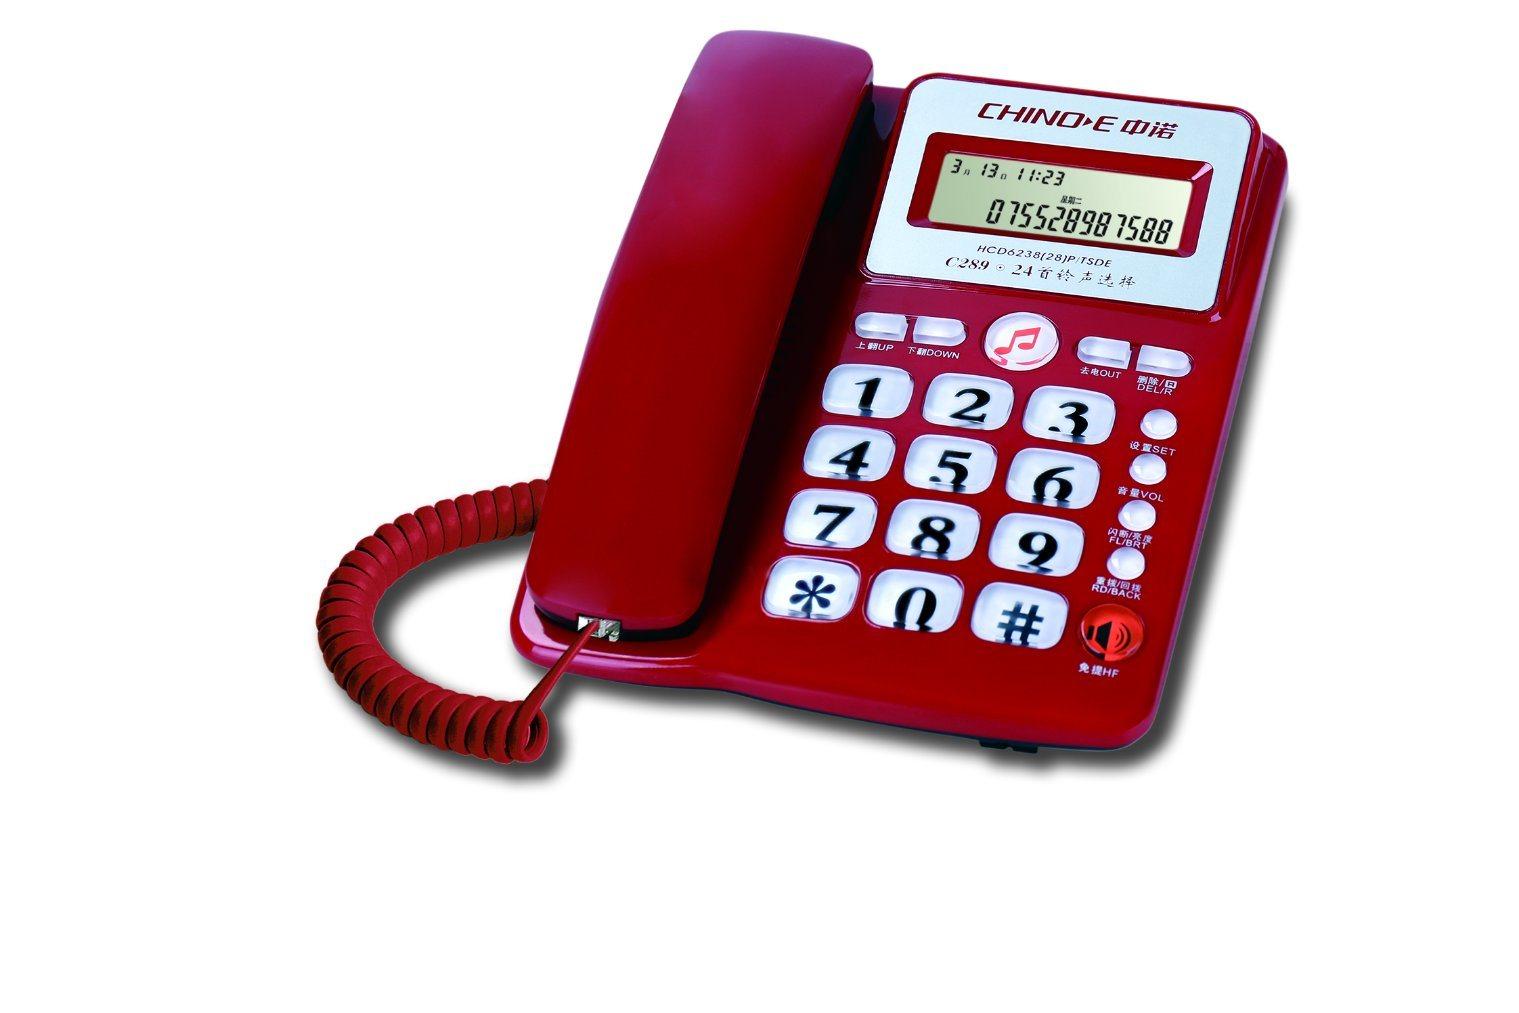 Caller ID Phone, Corded Phone, Home Phone, Lower Price, Handsfree Phone,